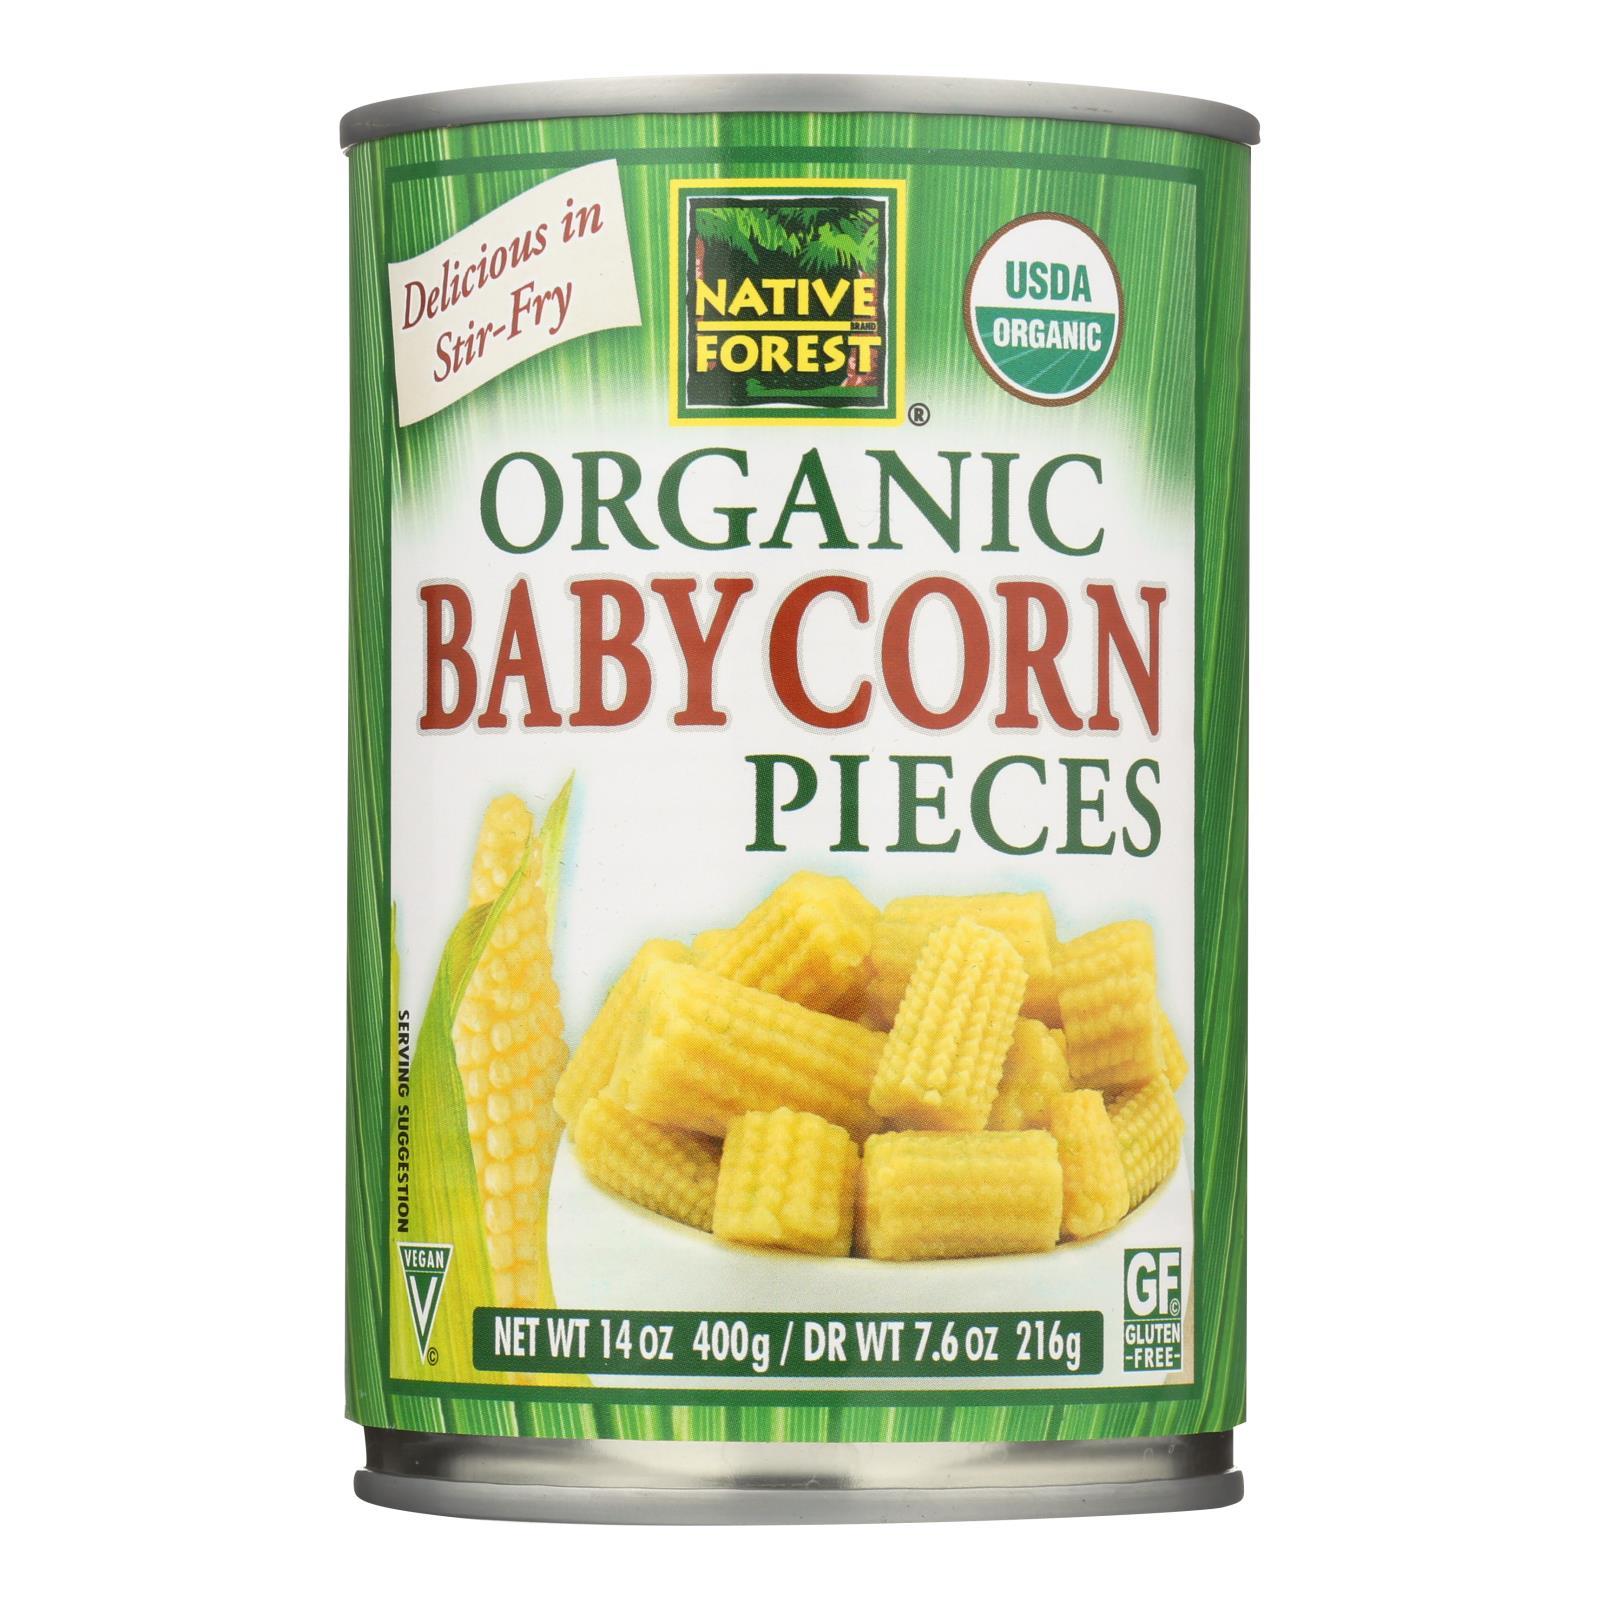 Native Forest Organic Cut Baby - Corn - Case Of 6 - 14 Oz.